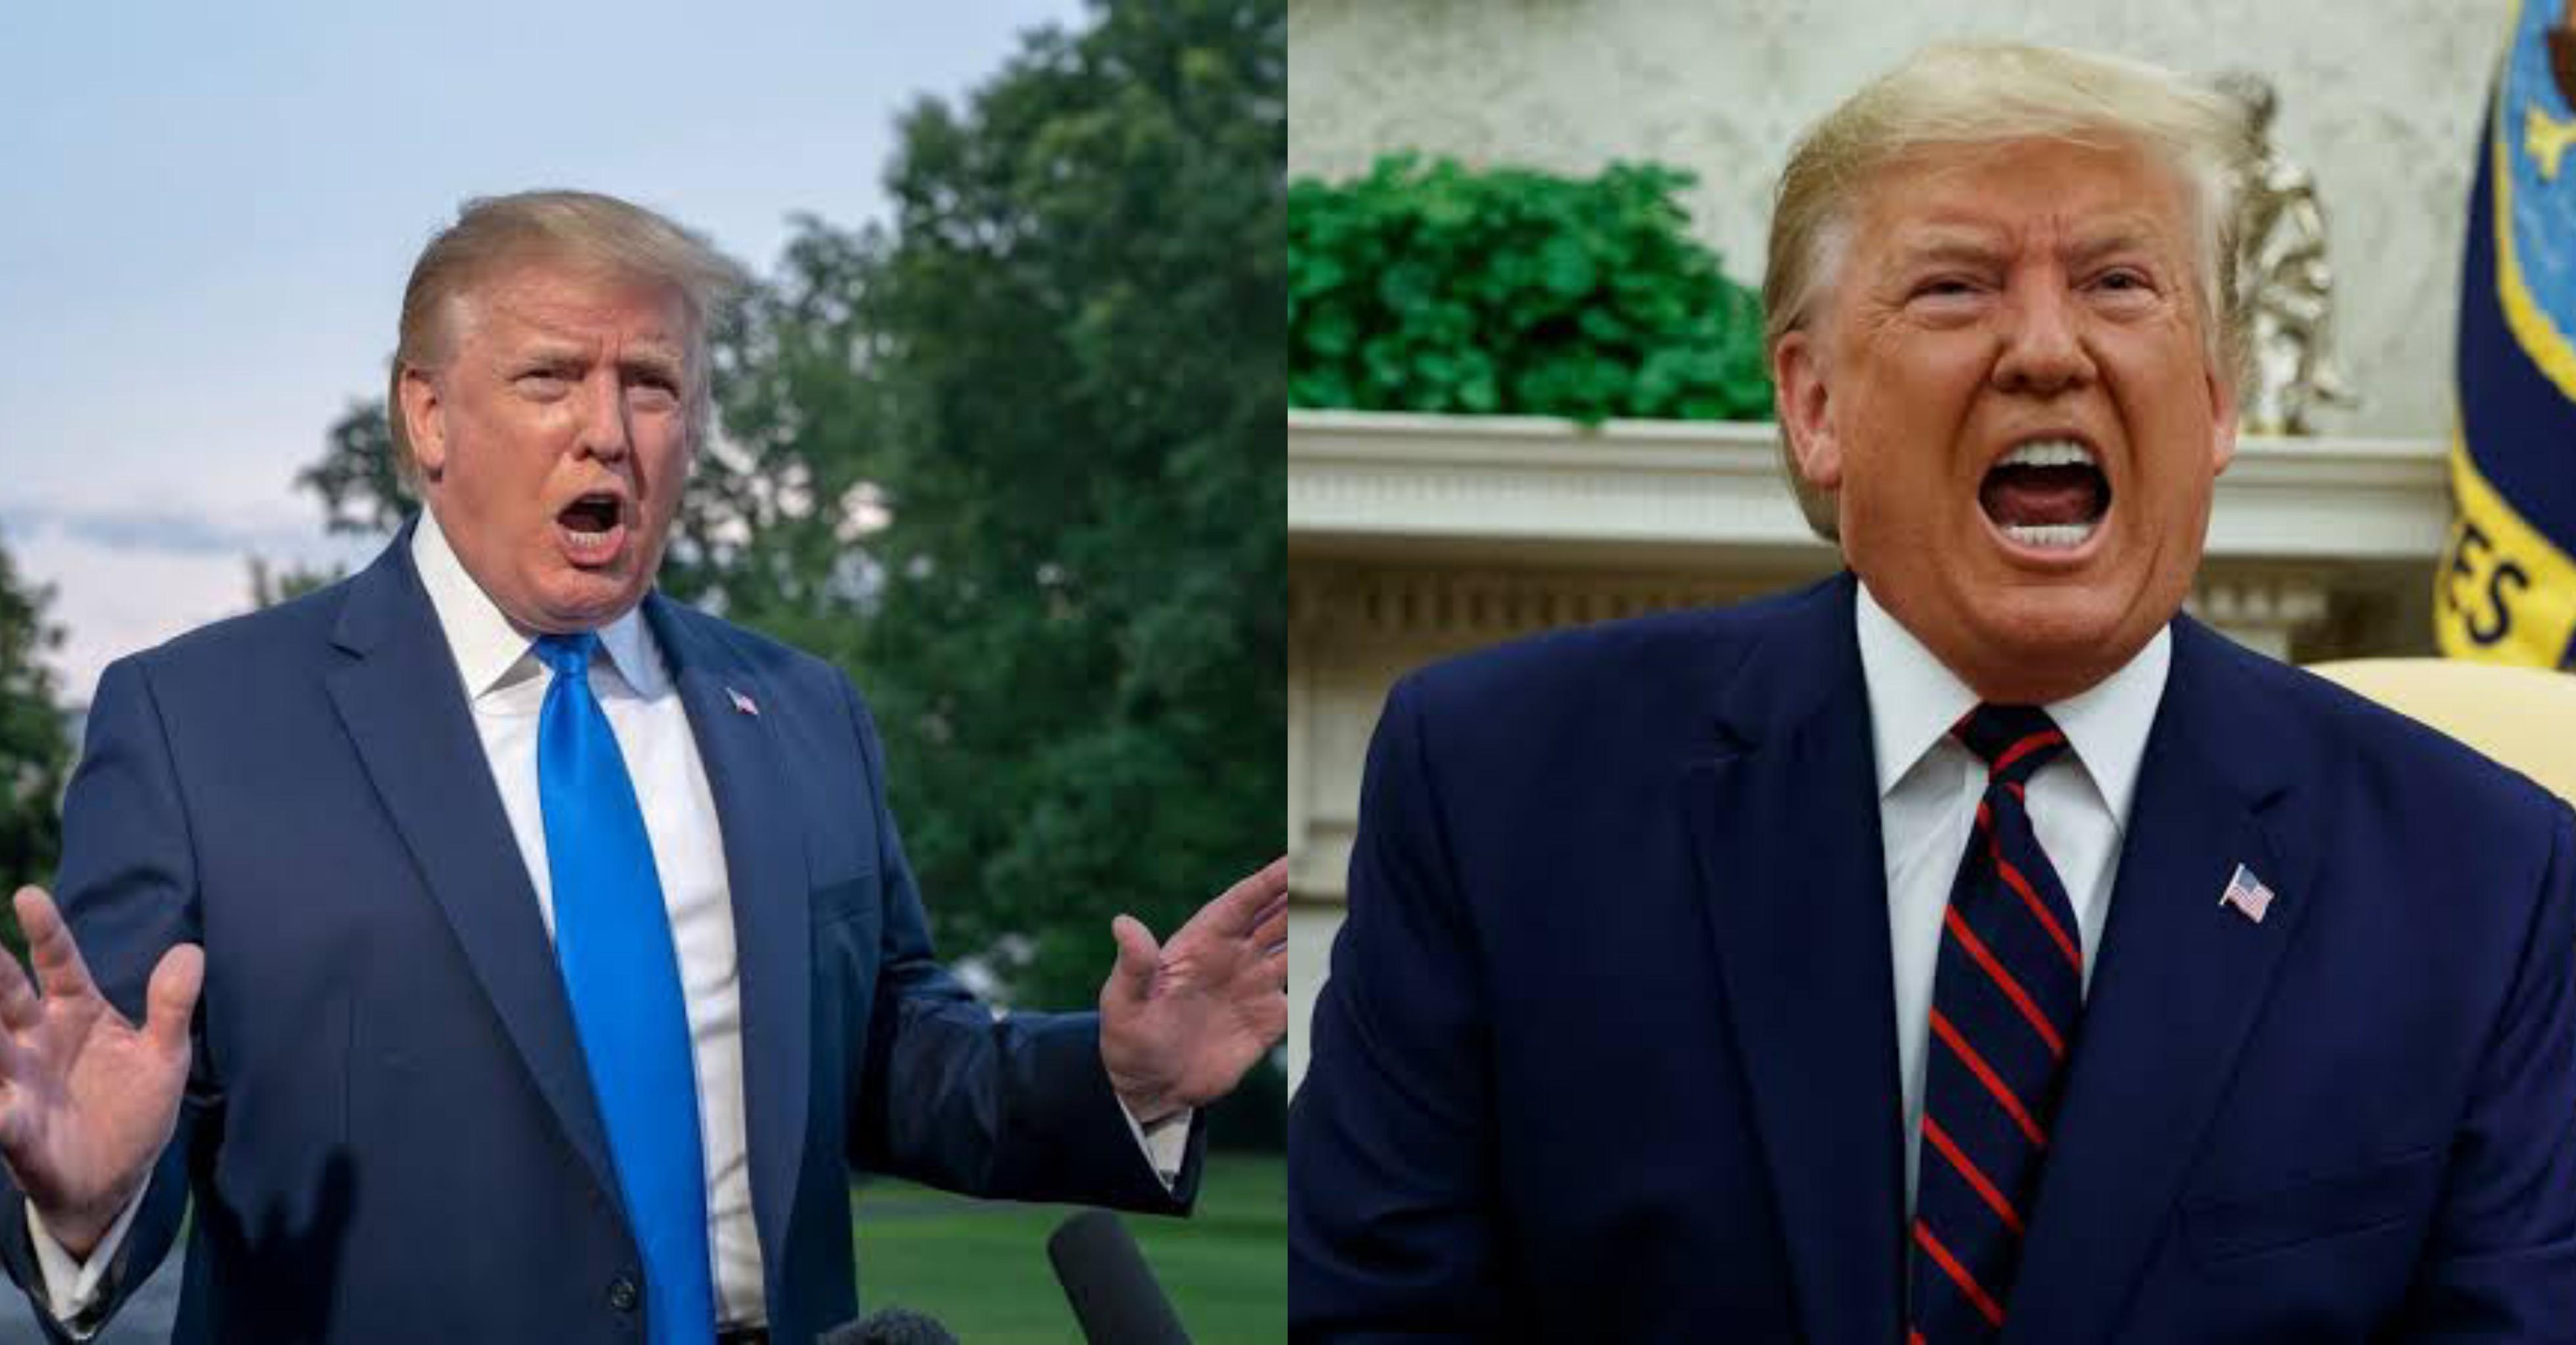 Coronavirus: President Trump Suspends Travel From Europe To USA For 30 Days.